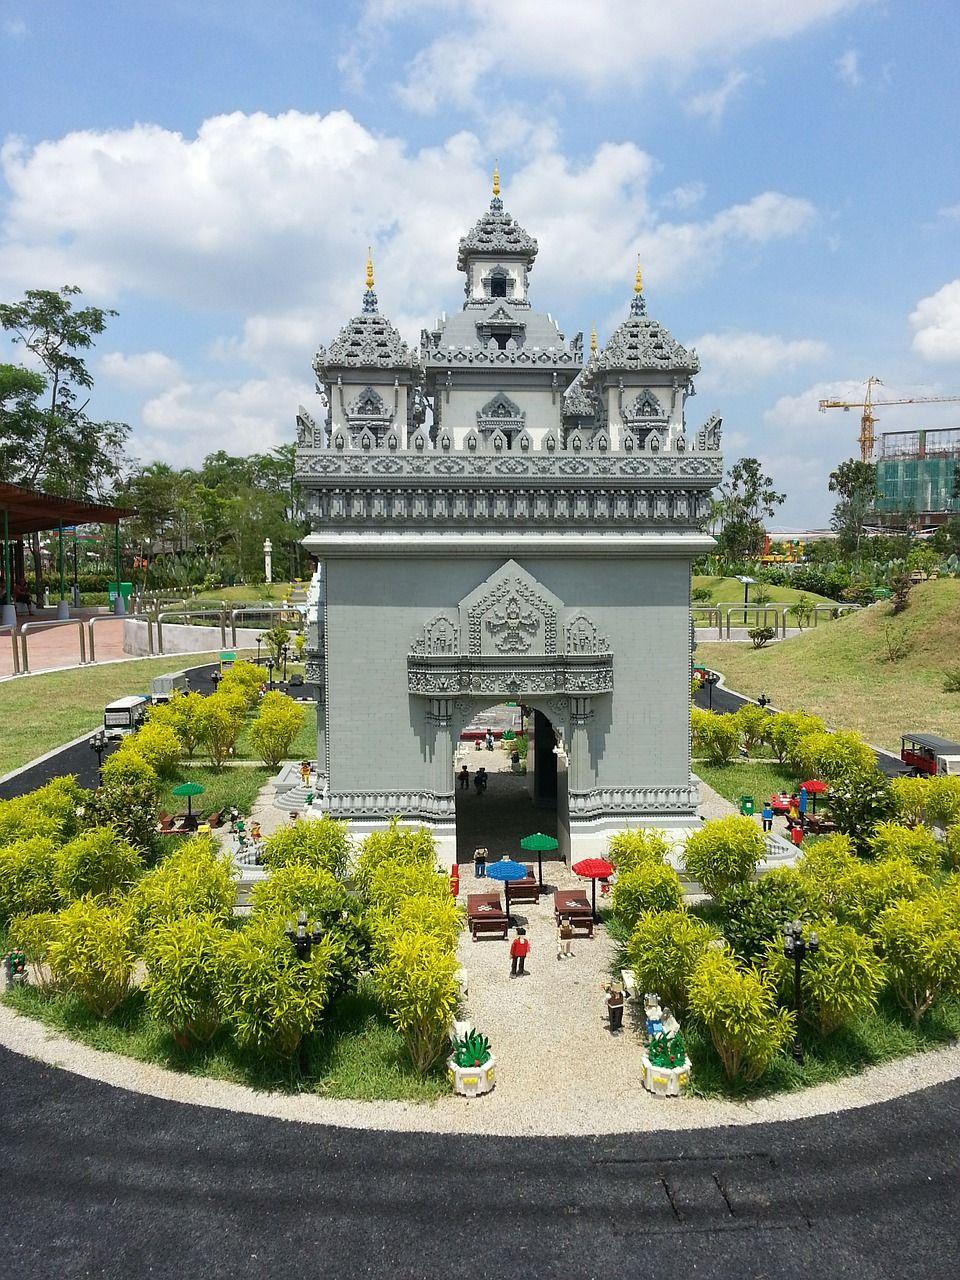 Park, Legoland Malaysia, Legoland, Malaysia #park, # ...